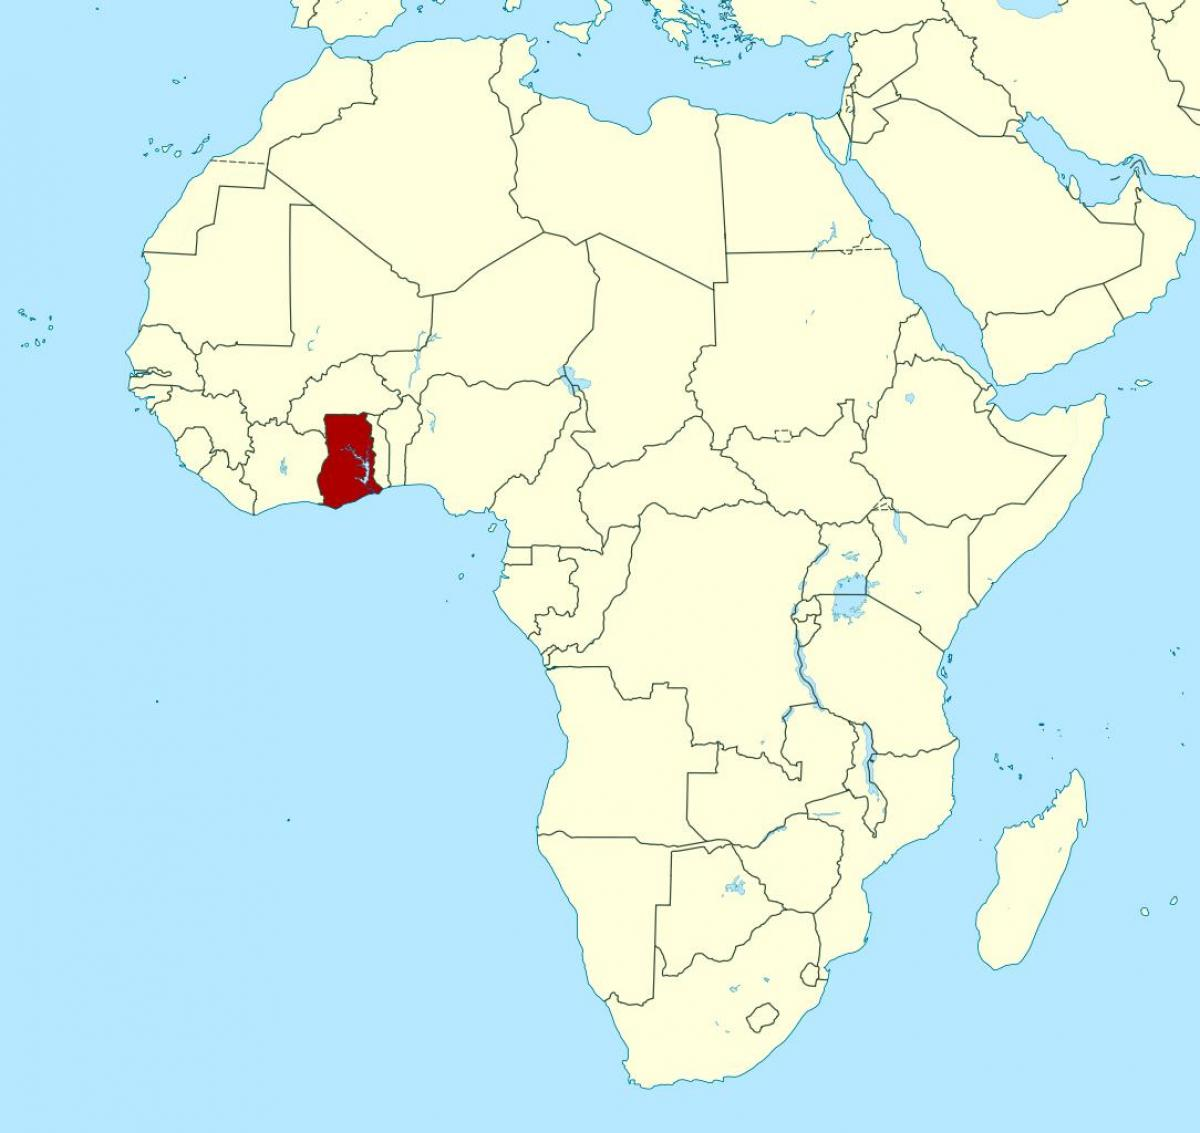 Karte Afrika.Ghana Afrika Karte Karte Von Afrika Zeigt Ghana West